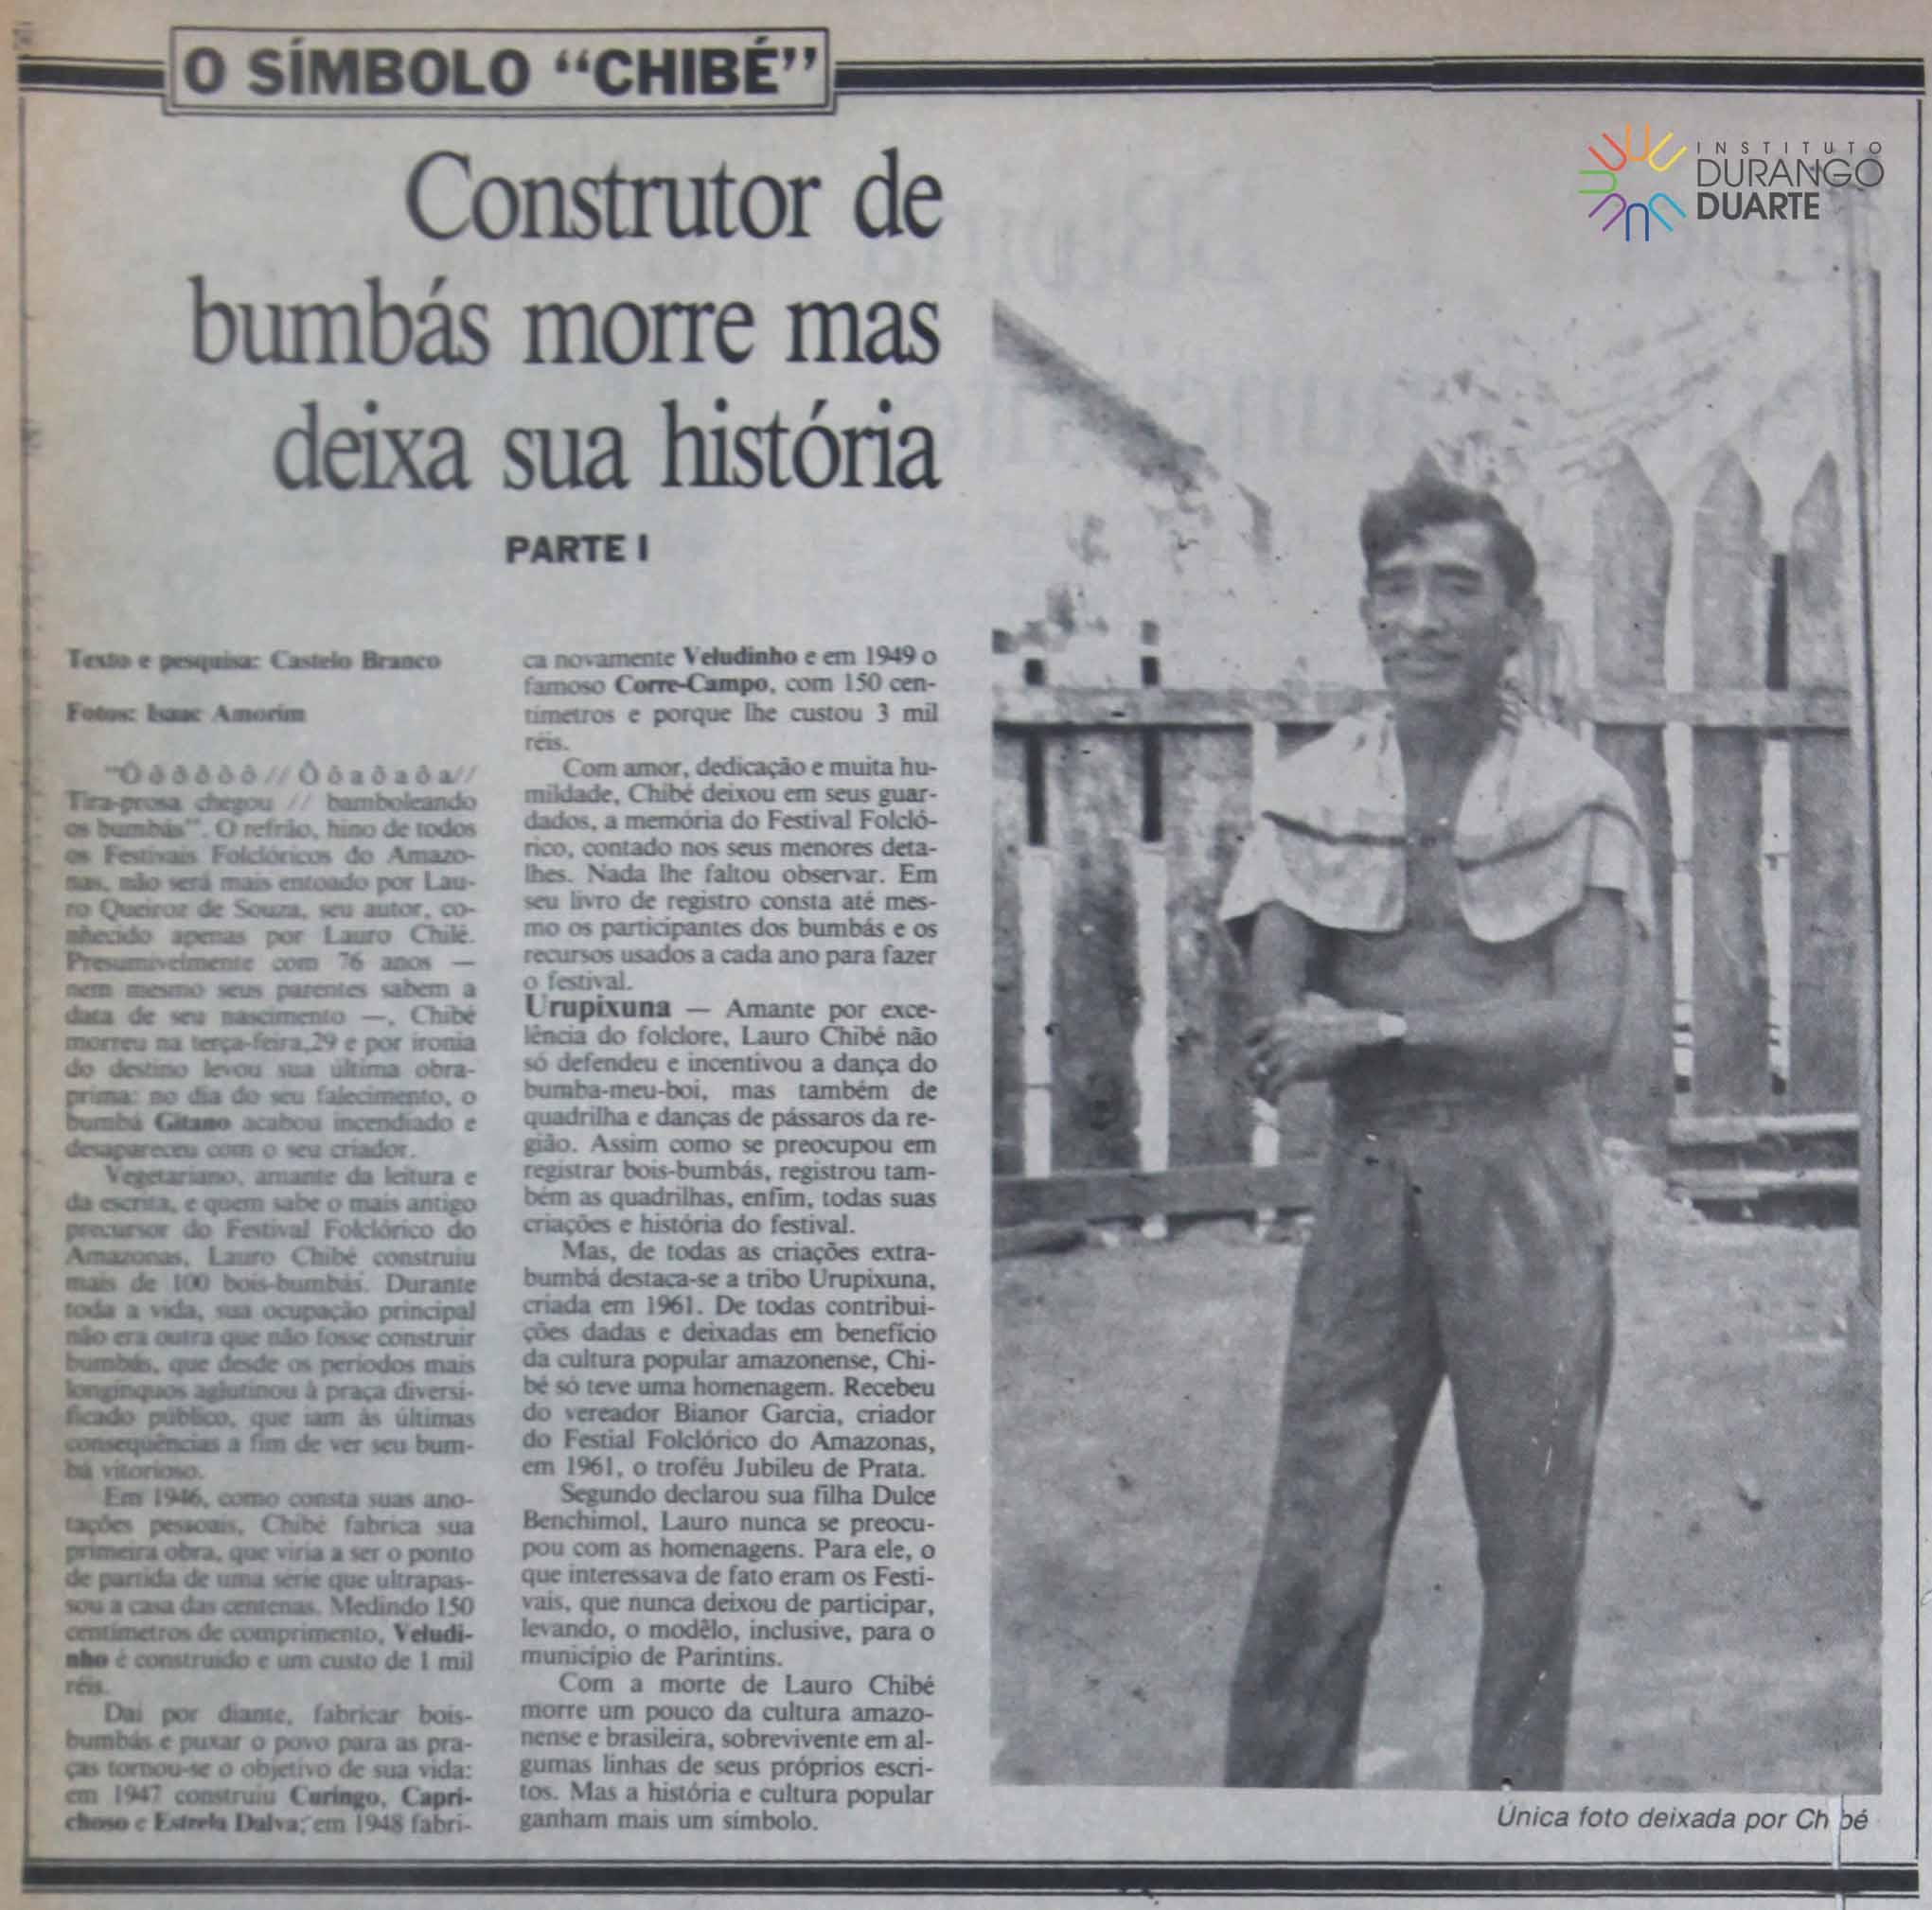 Morre o construtor de bumbás Lauro Chibé